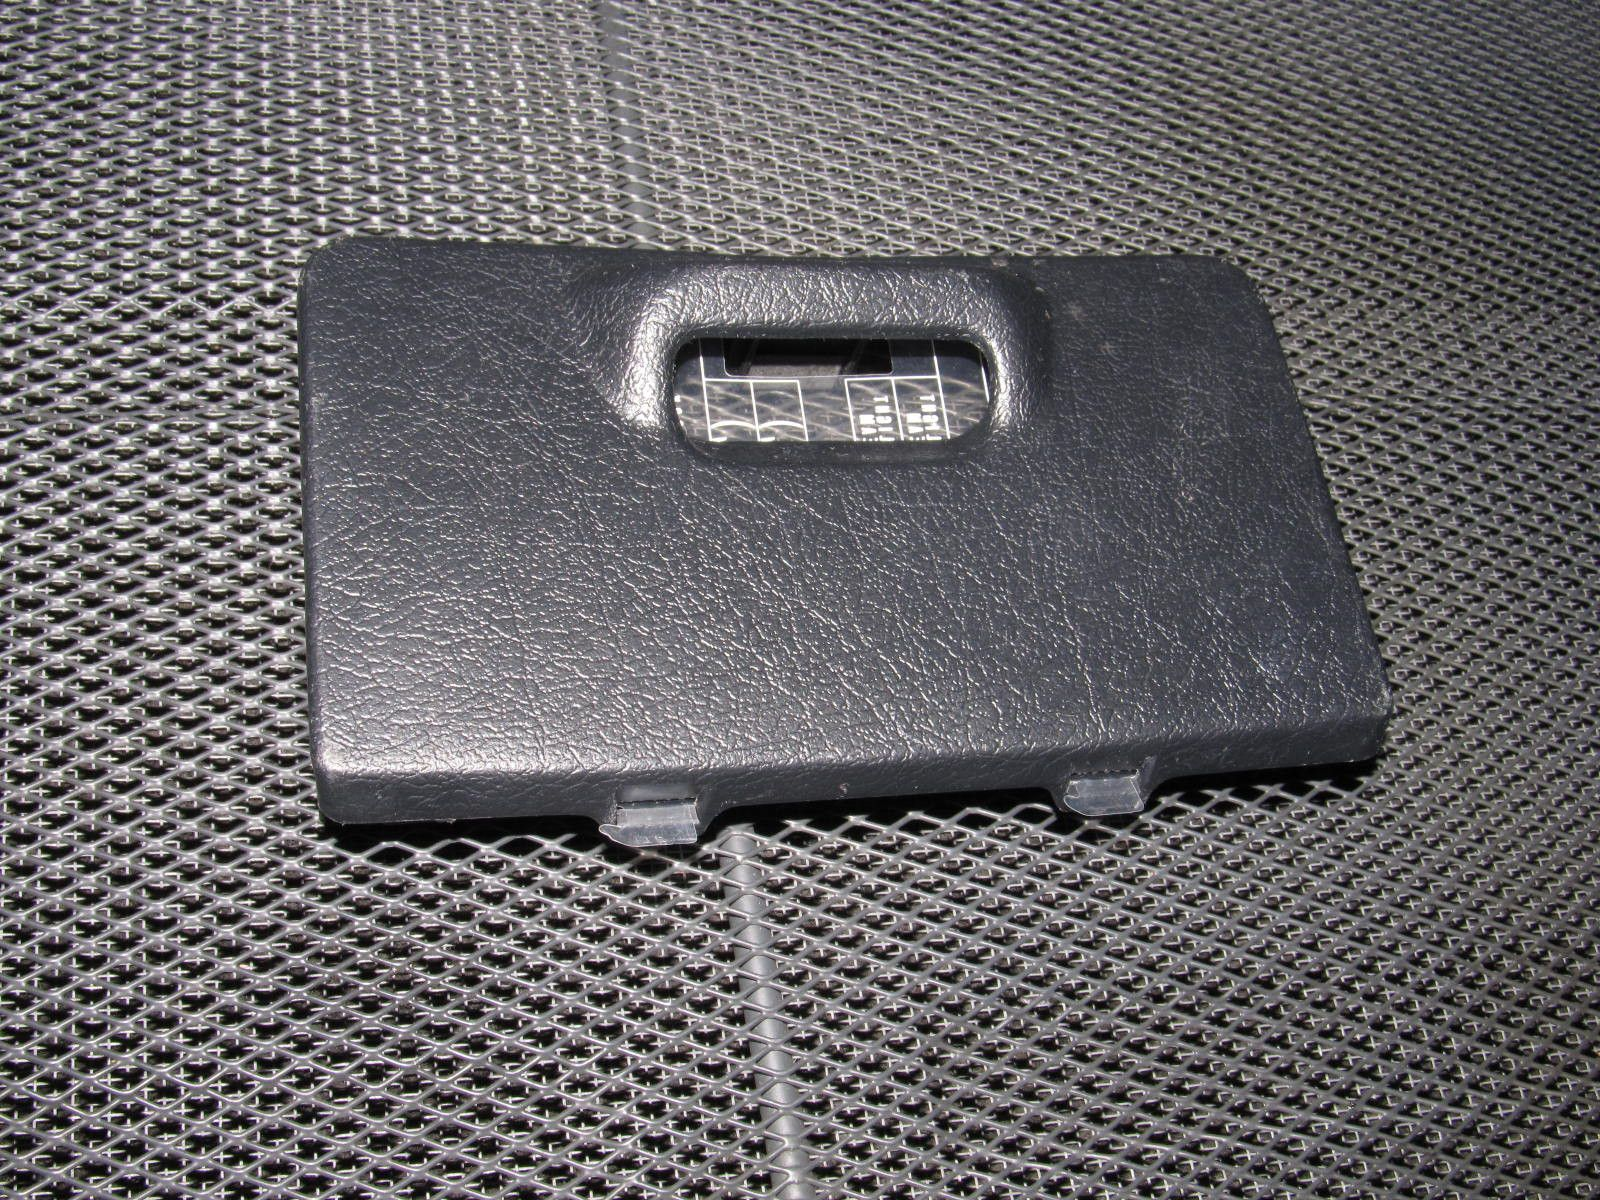 94 95 96 97 98 99 00 01 Acura Integra OEM Interior Fuse Box Cover